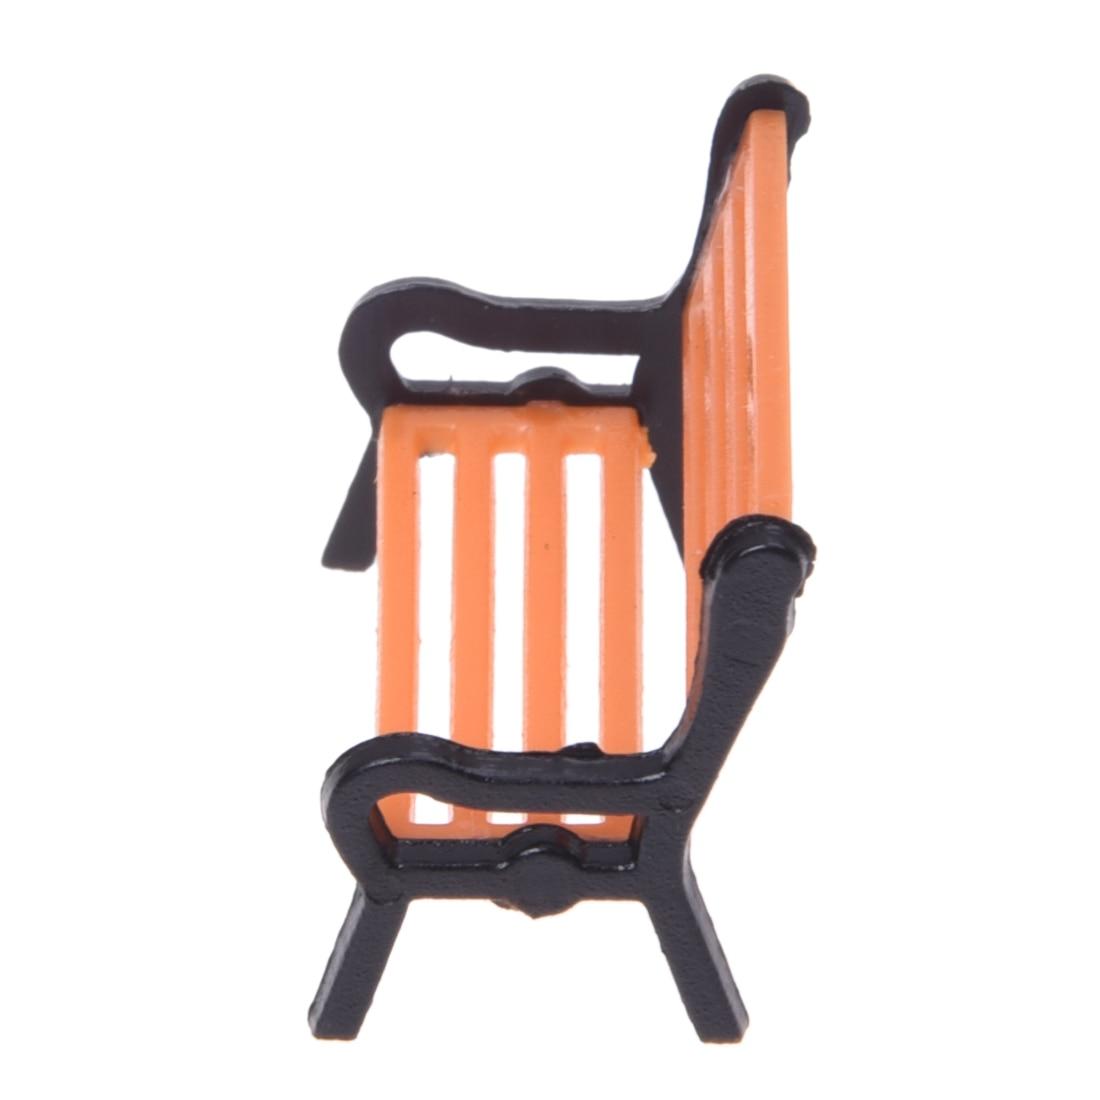 5pcs Model Train Platform Park Street Seat Bench Chair Settee 1:50 Mini Garden Ornament Miniature Park Bench